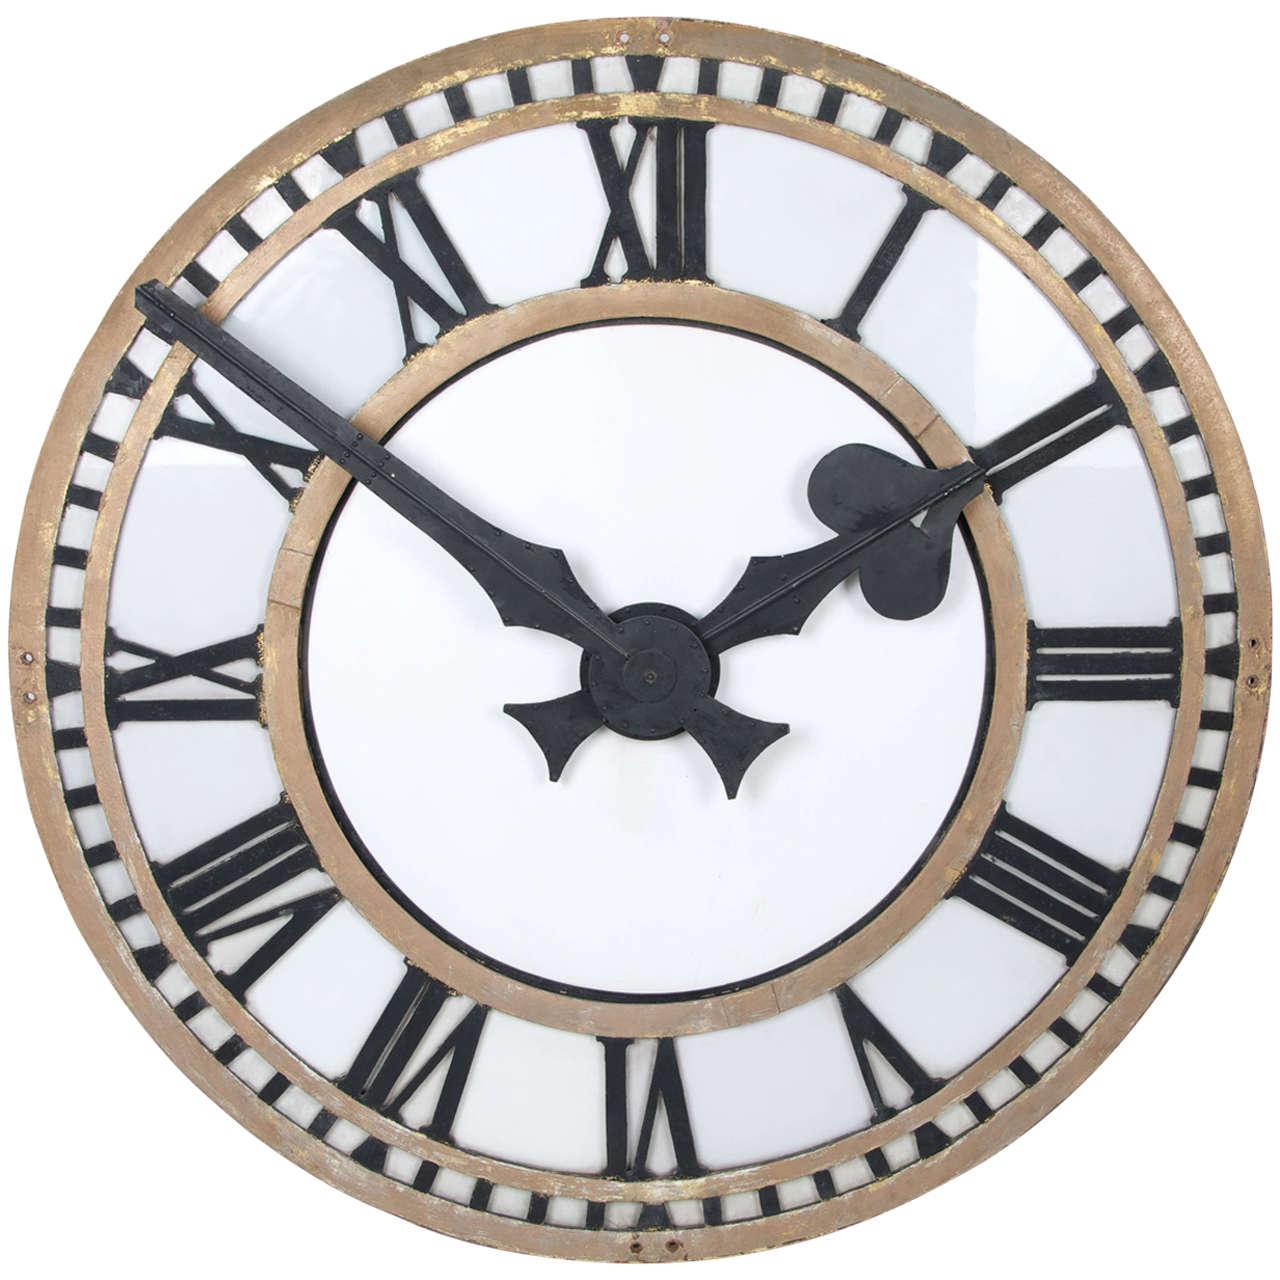 the clock 1920 - photo #34